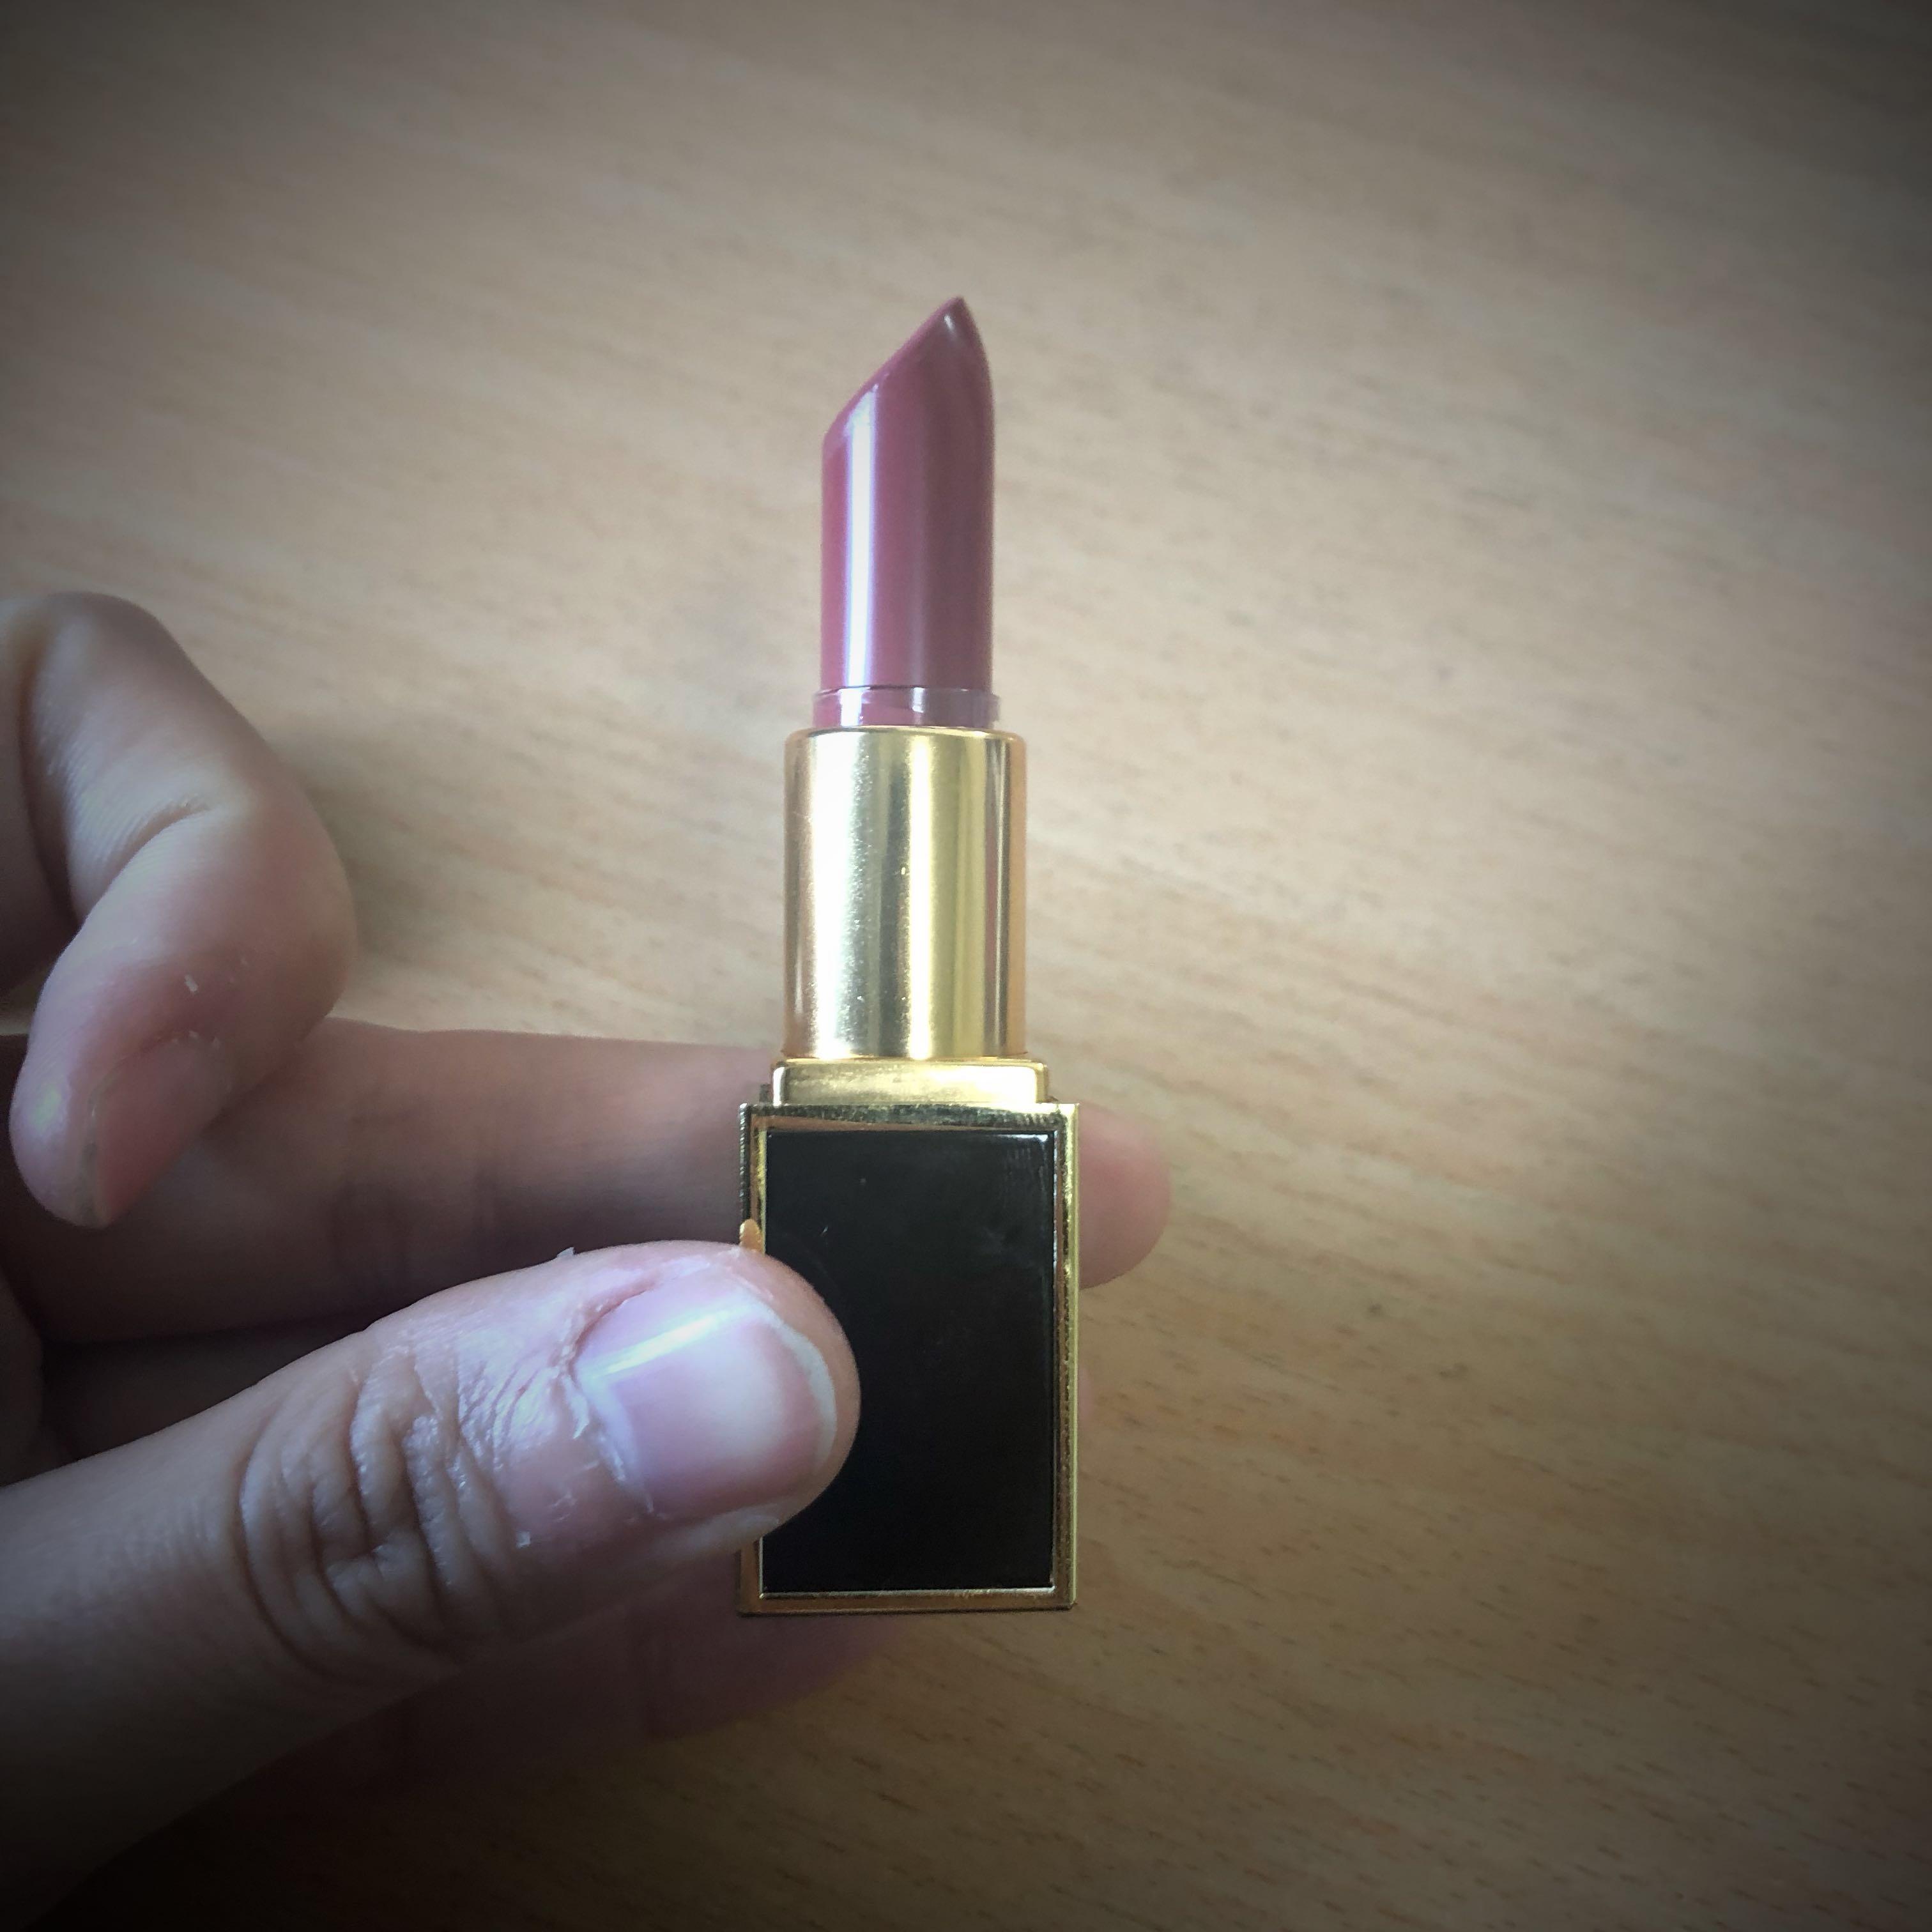 Tom Ford Lips and Boys lipstick (Richard)